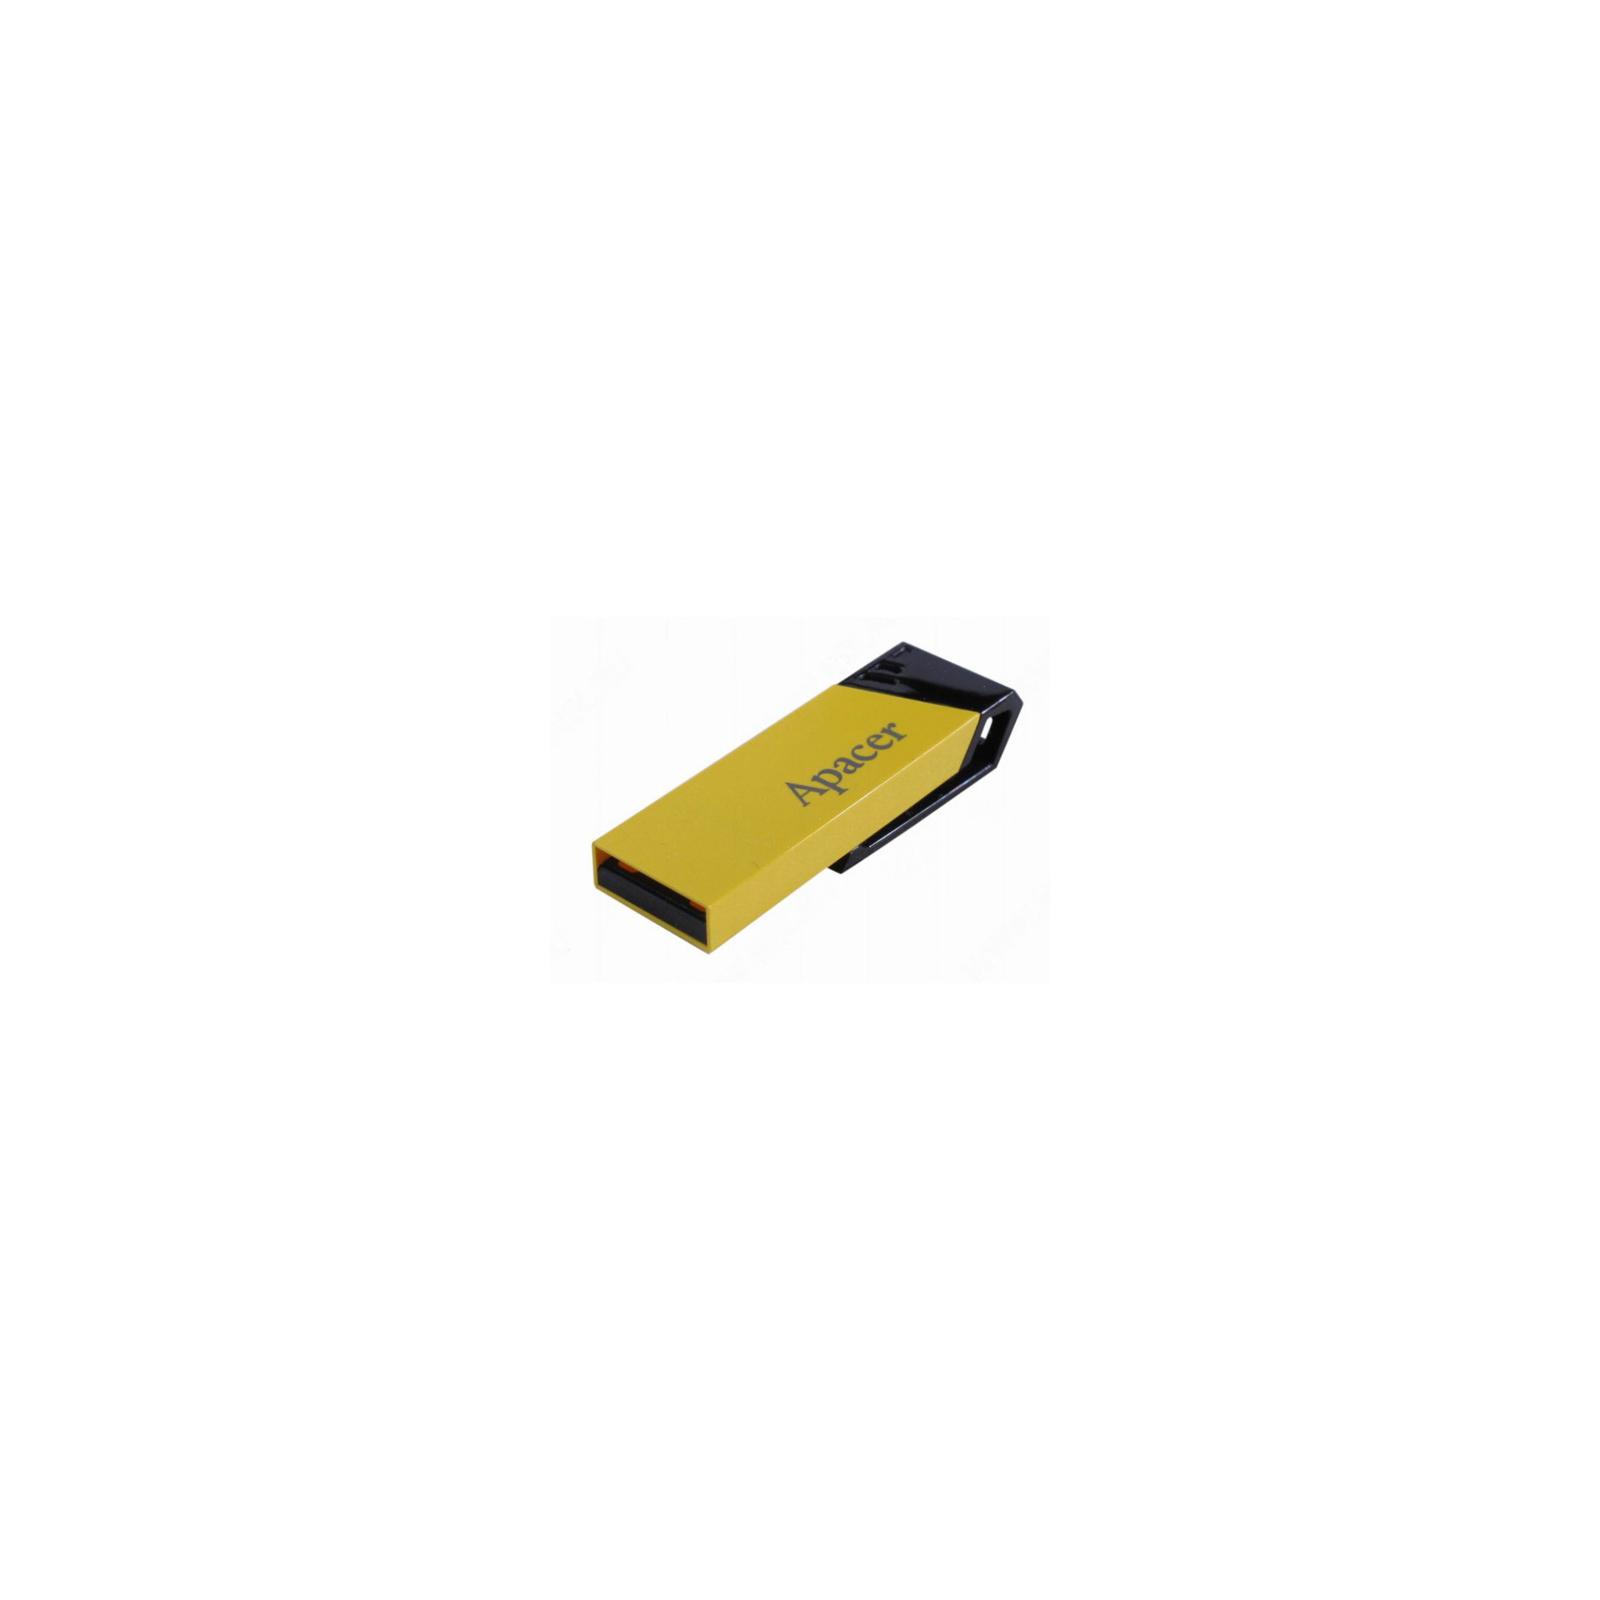 USB флеш накопитель 8GB AH131 Yellow RP USB2.0 Apacer (AP8GAH131Y-1) изображение 5